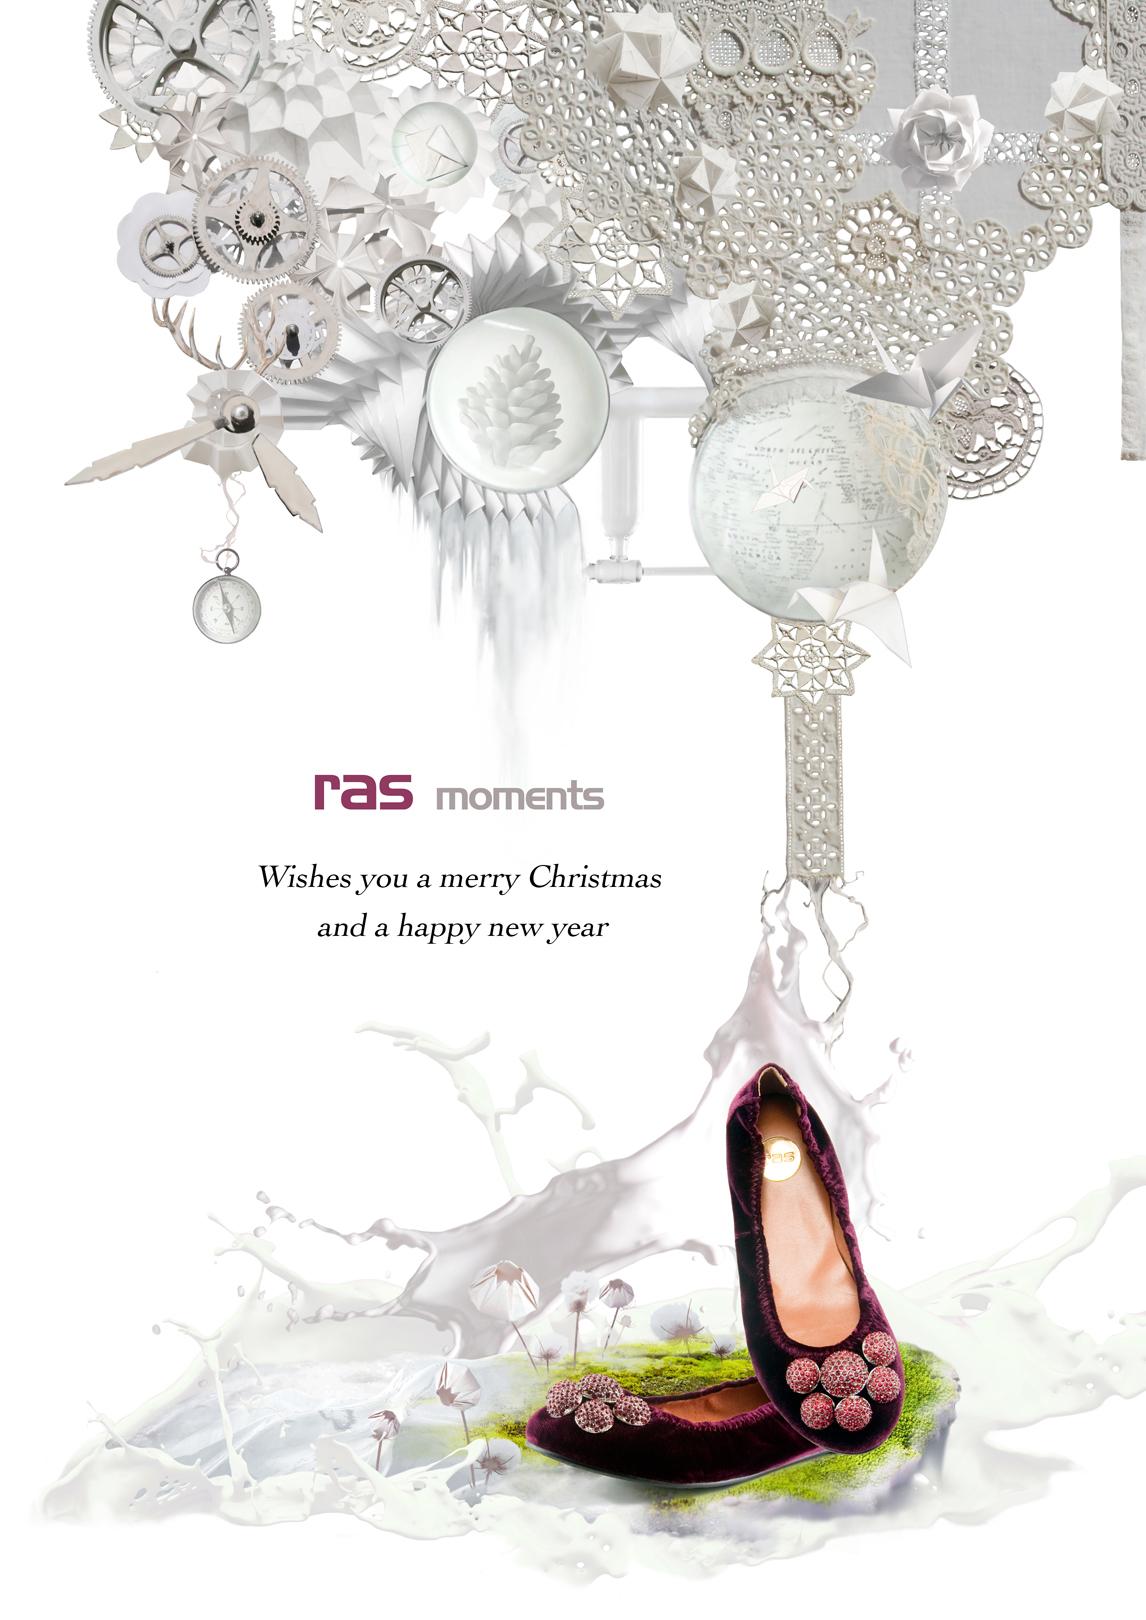 http://thaisgarcias.com/wp-content/uploads/2014/11/ras-shoes-postal-2013-2-sin-texto-baja1.jpg